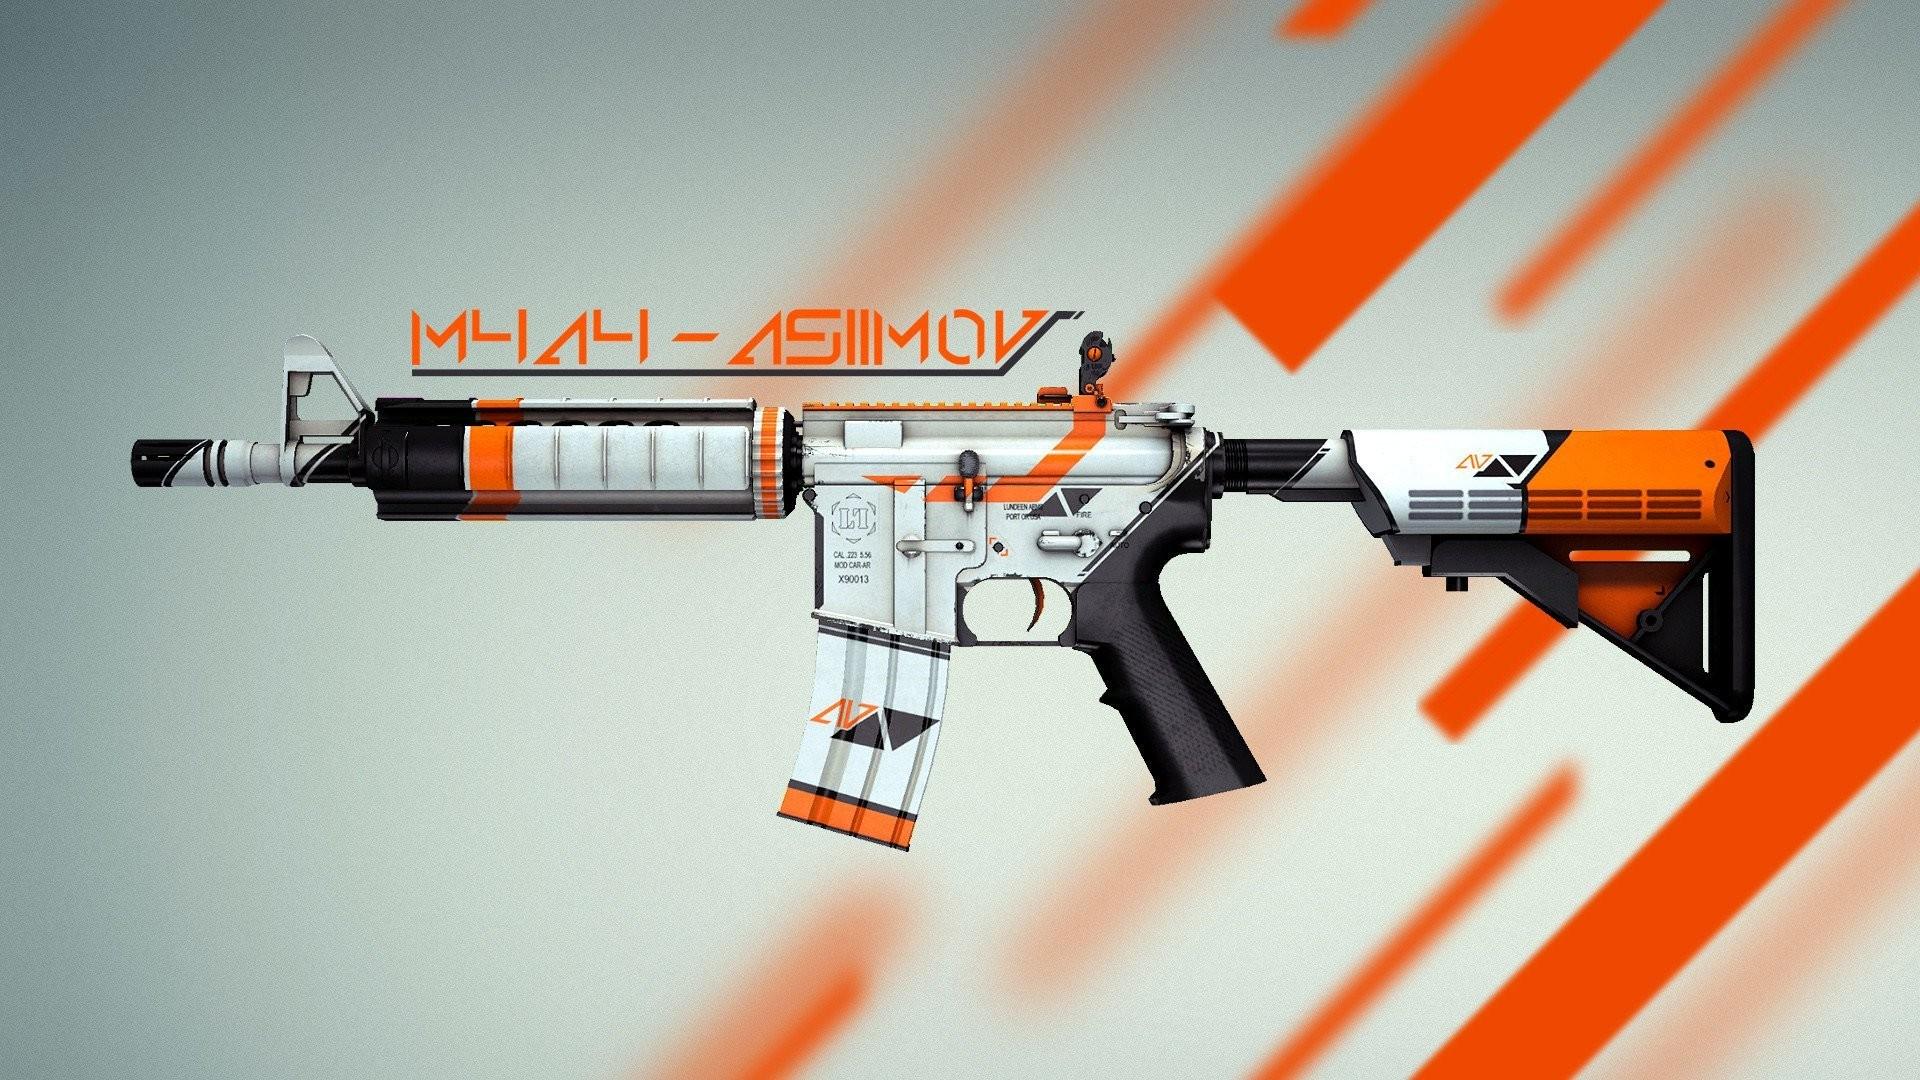 … m4a4 asiimov cs go counter strike global offensive skin hd wallpaper …